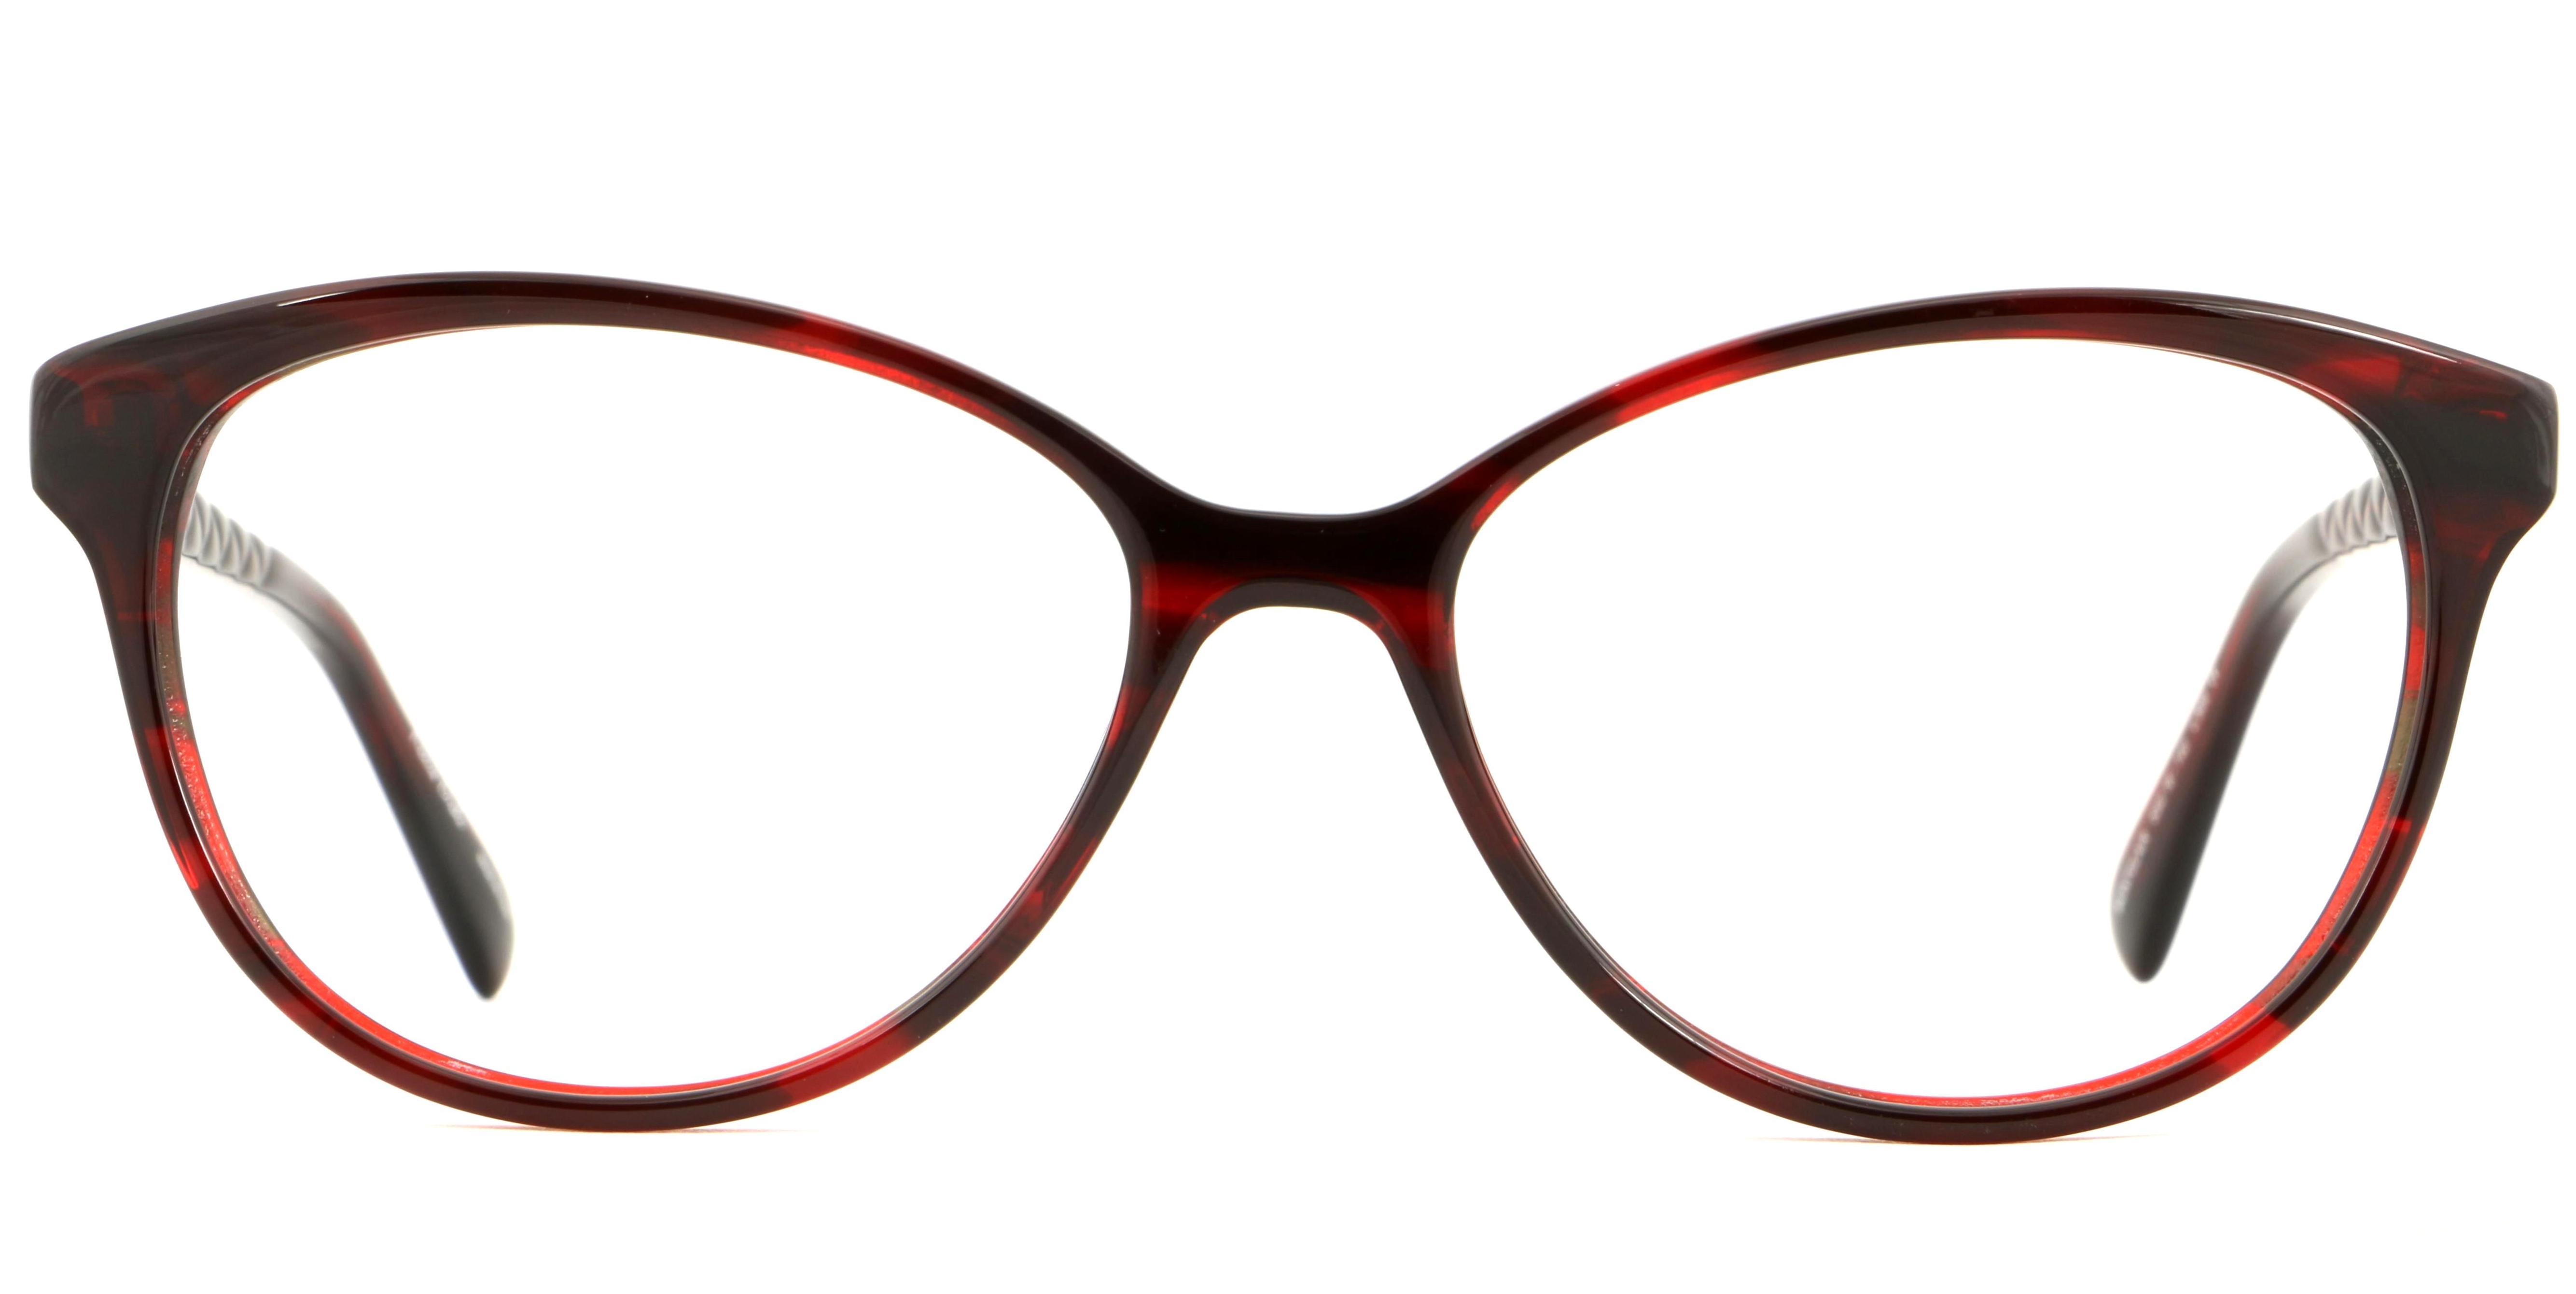 Glasses Frames Made Of : Four in Five Eyeglass Wearers Prefer Eyeglasses Made in ...